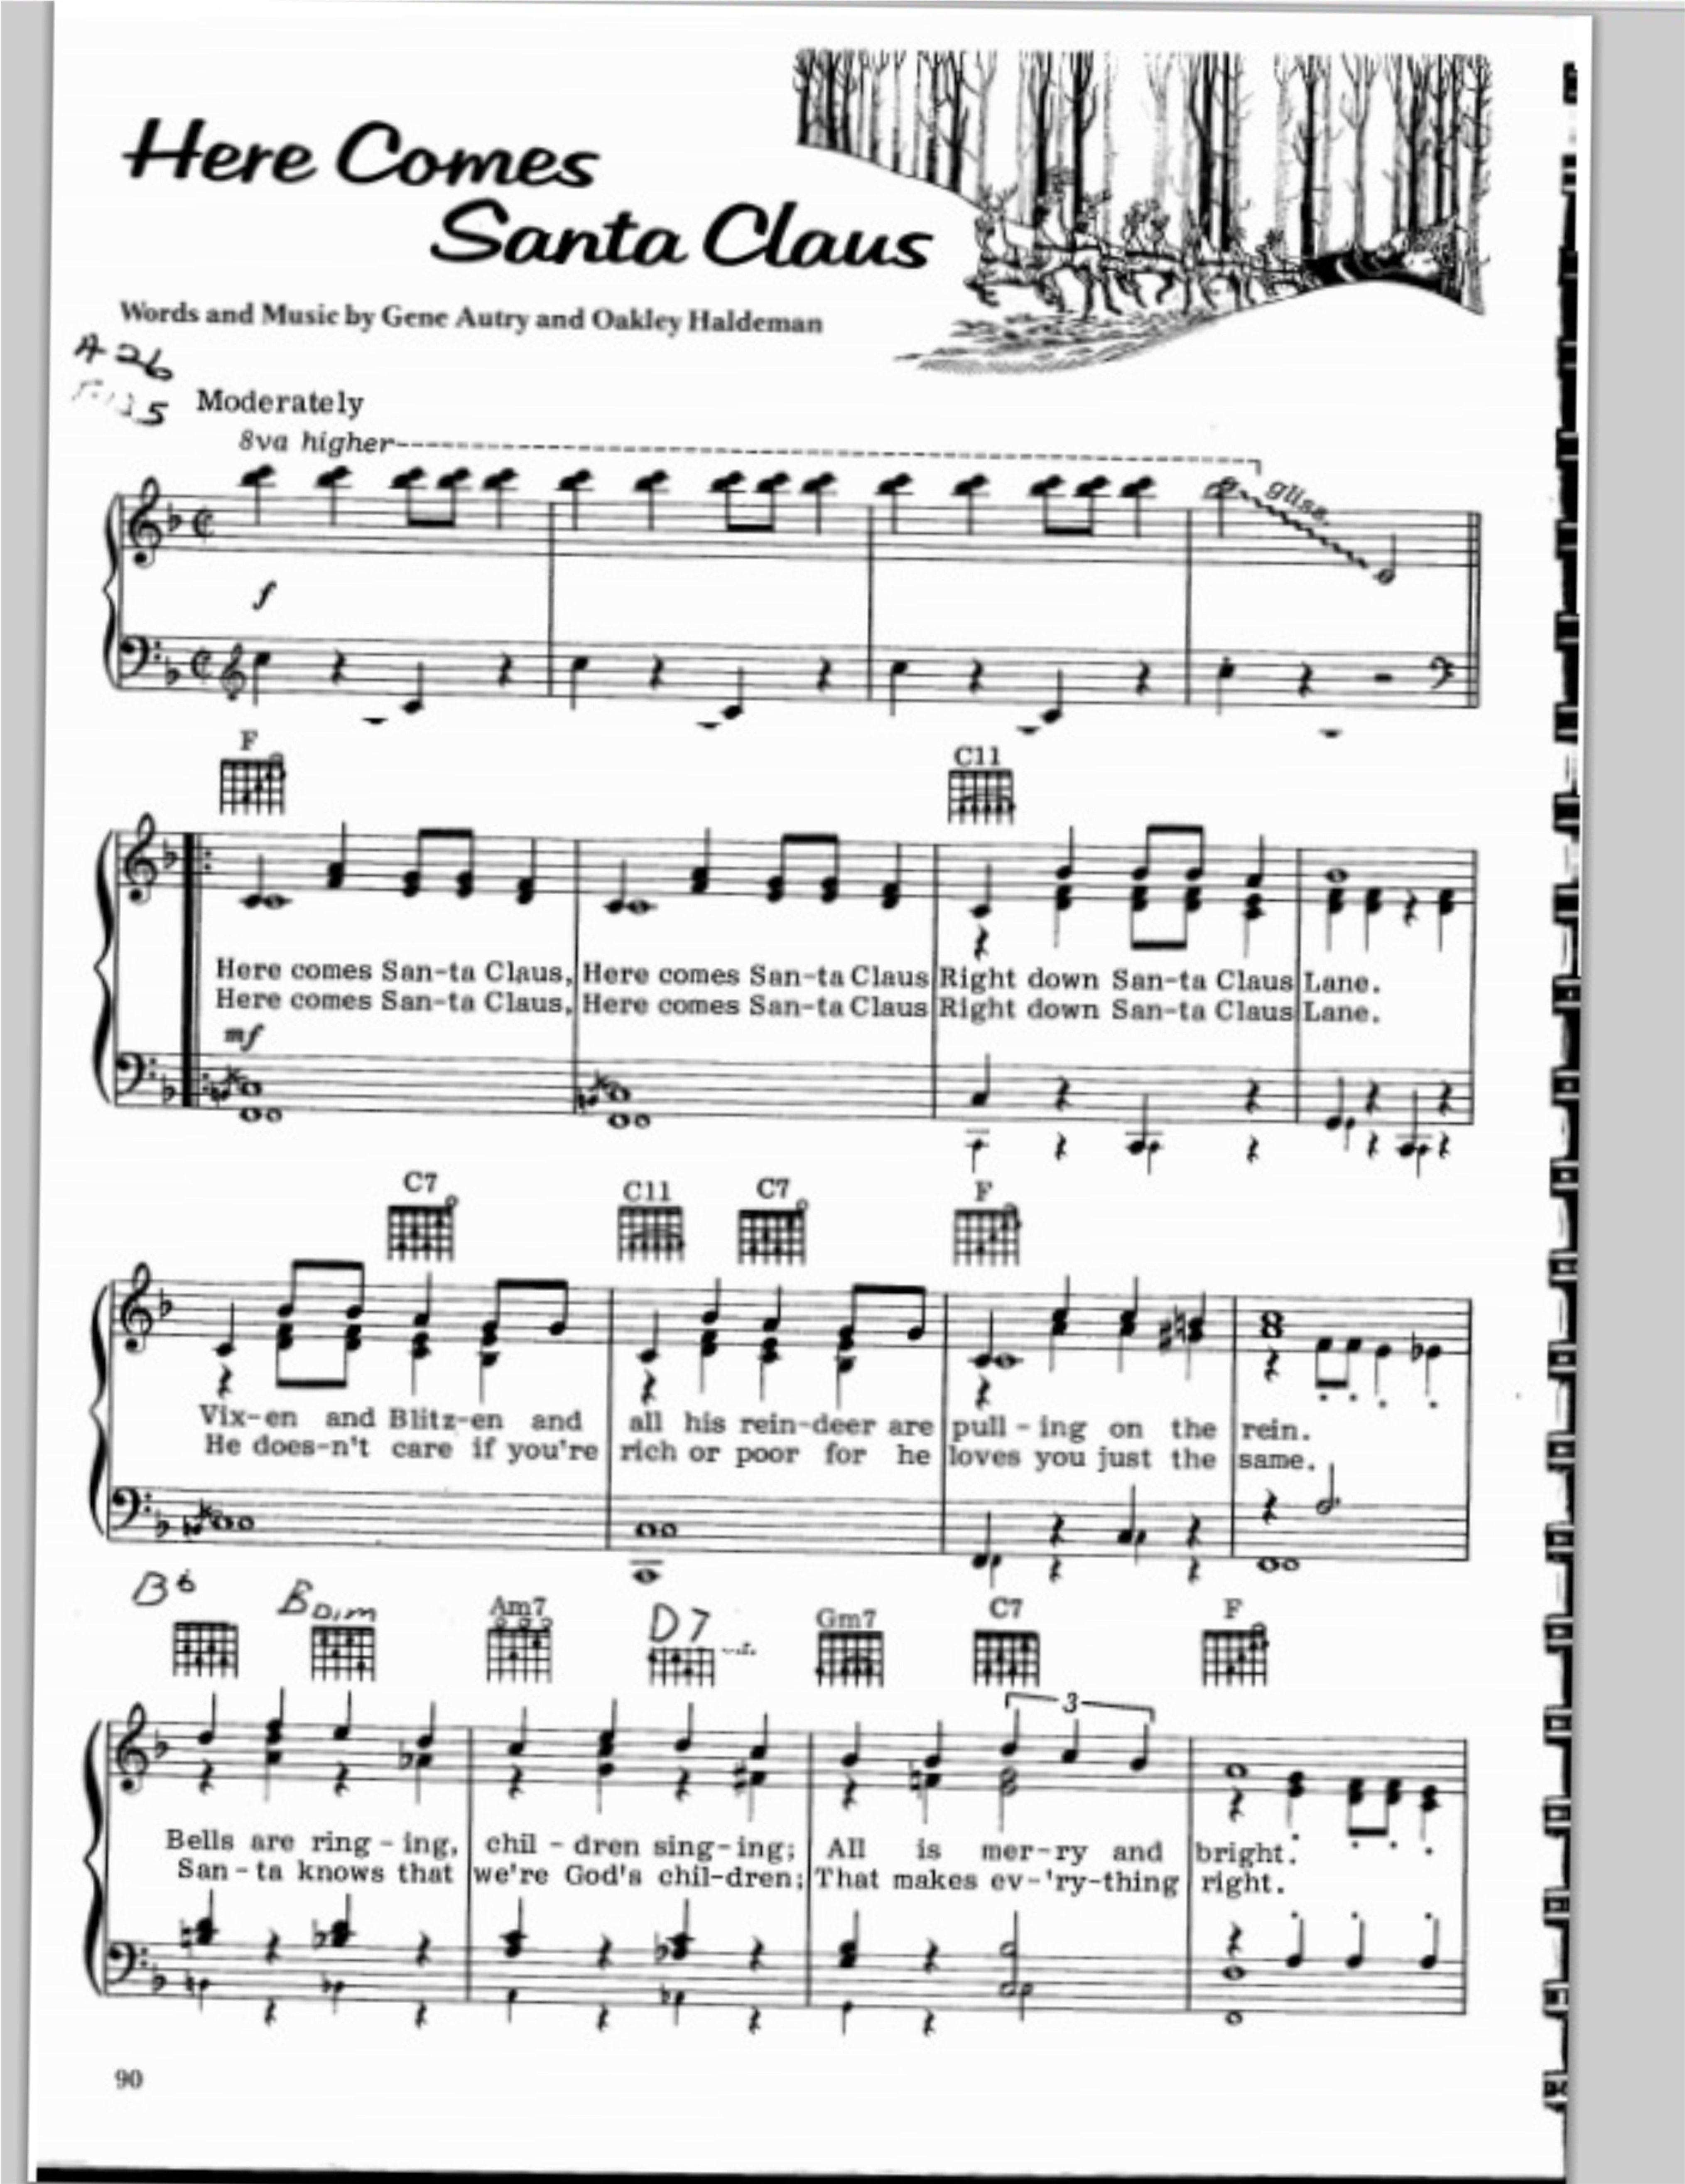 Http://www.writtenmelodies.com/Piano/Seasonal/Sheets/Here